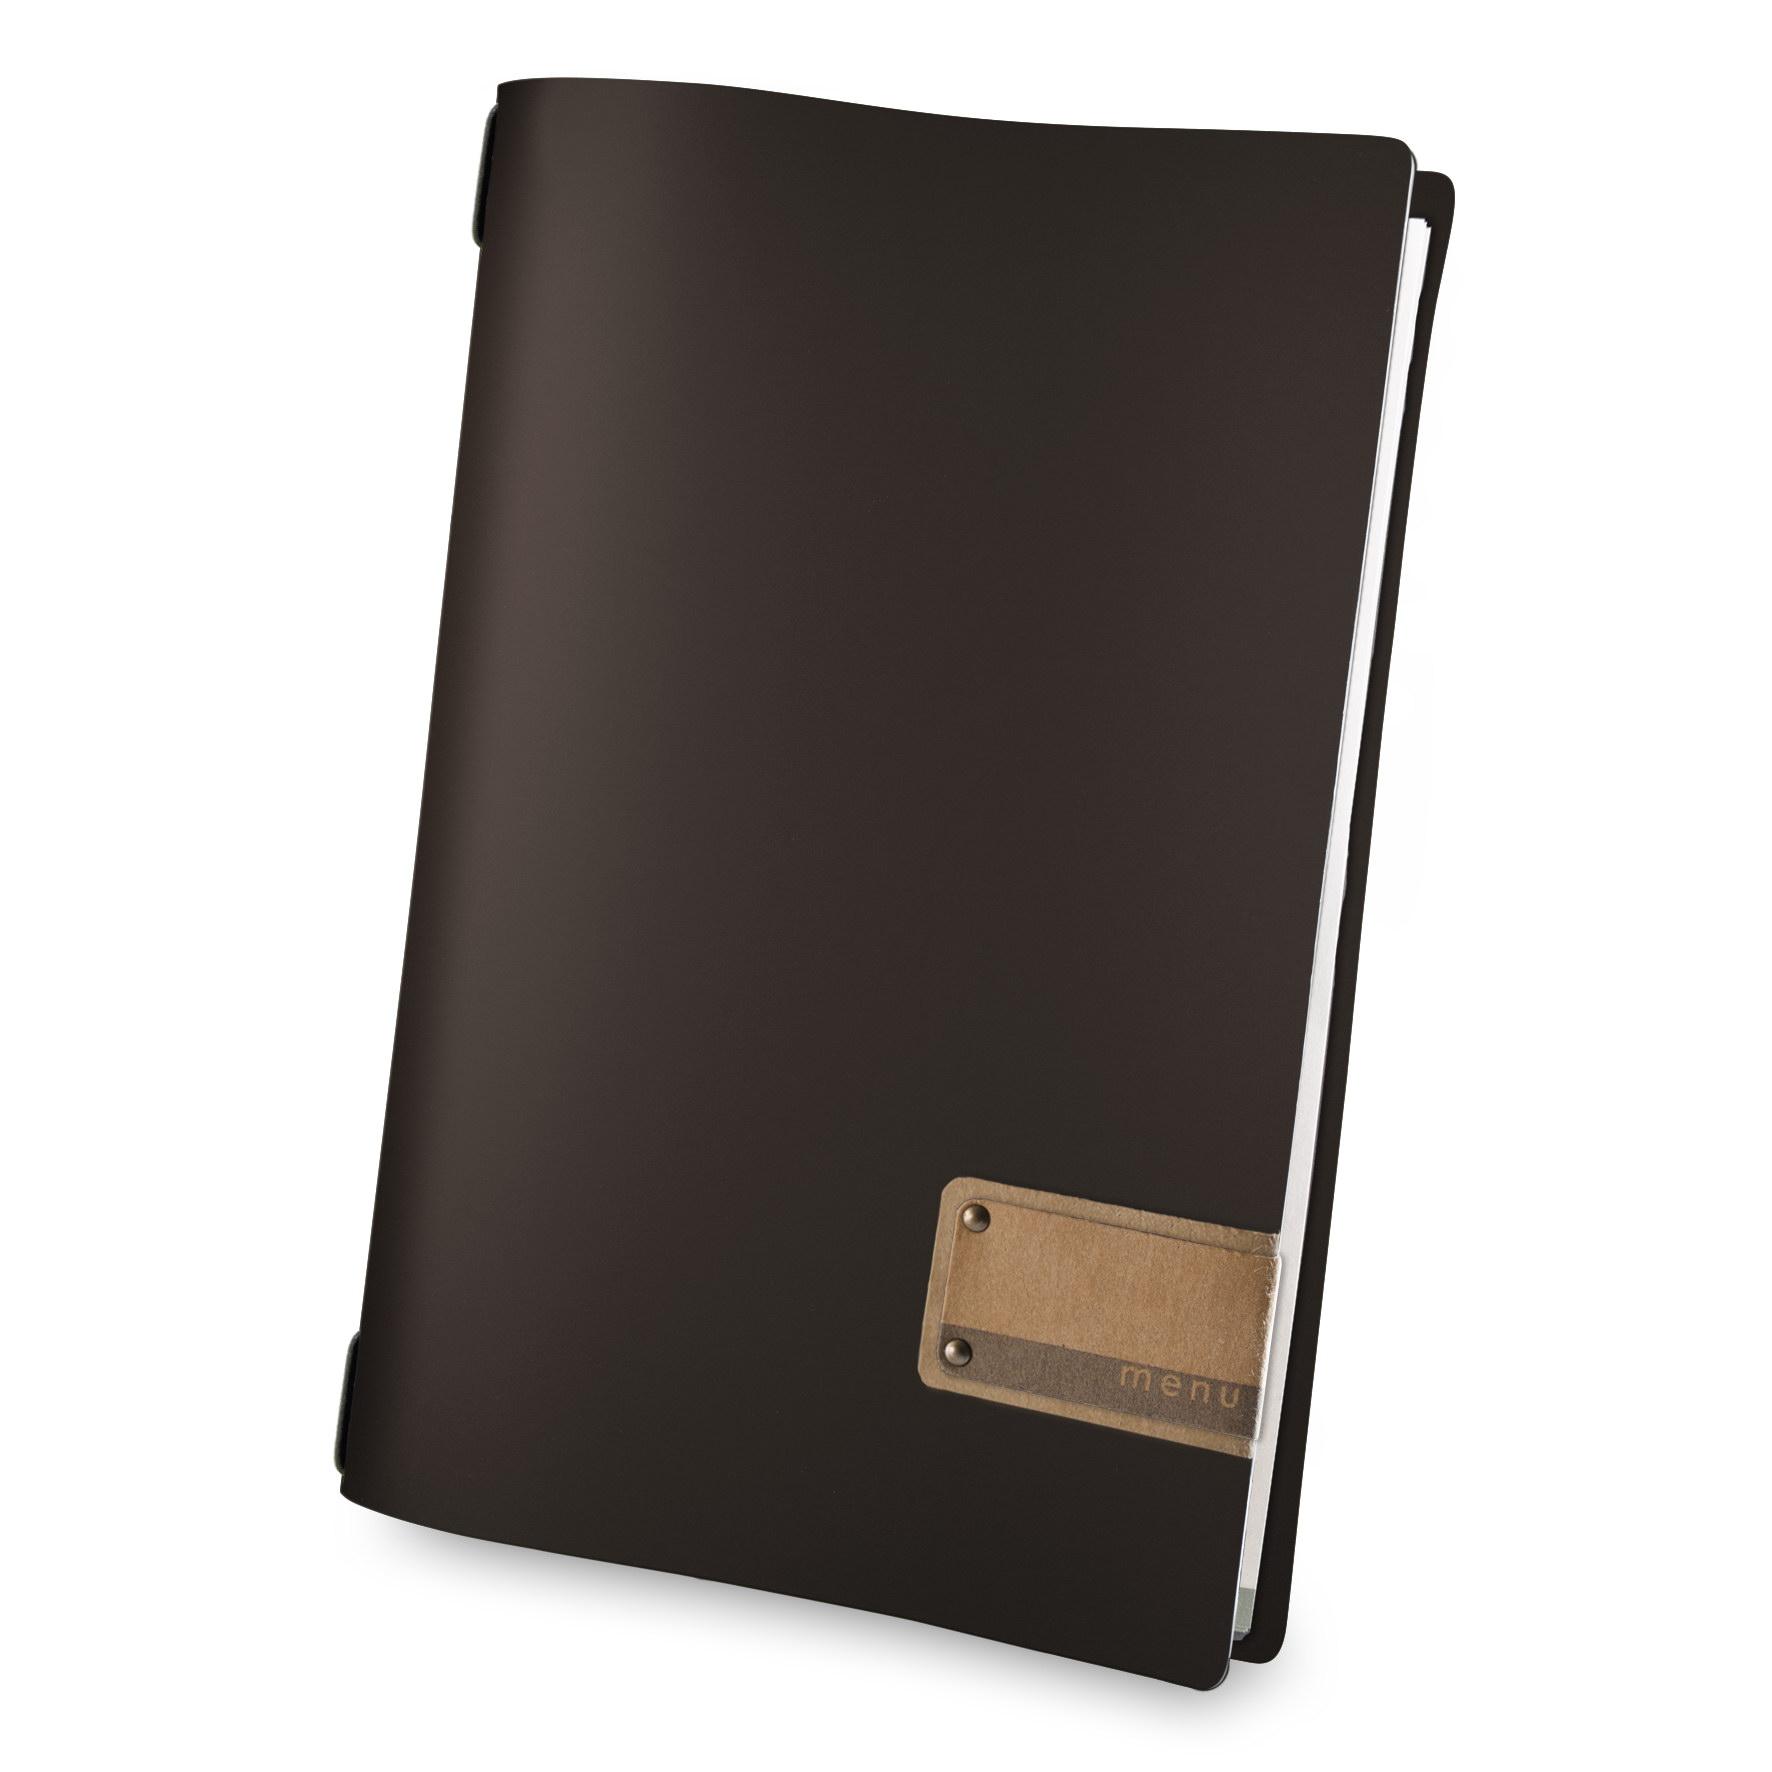 Protège menu A4 Fashion marron aspect lisse